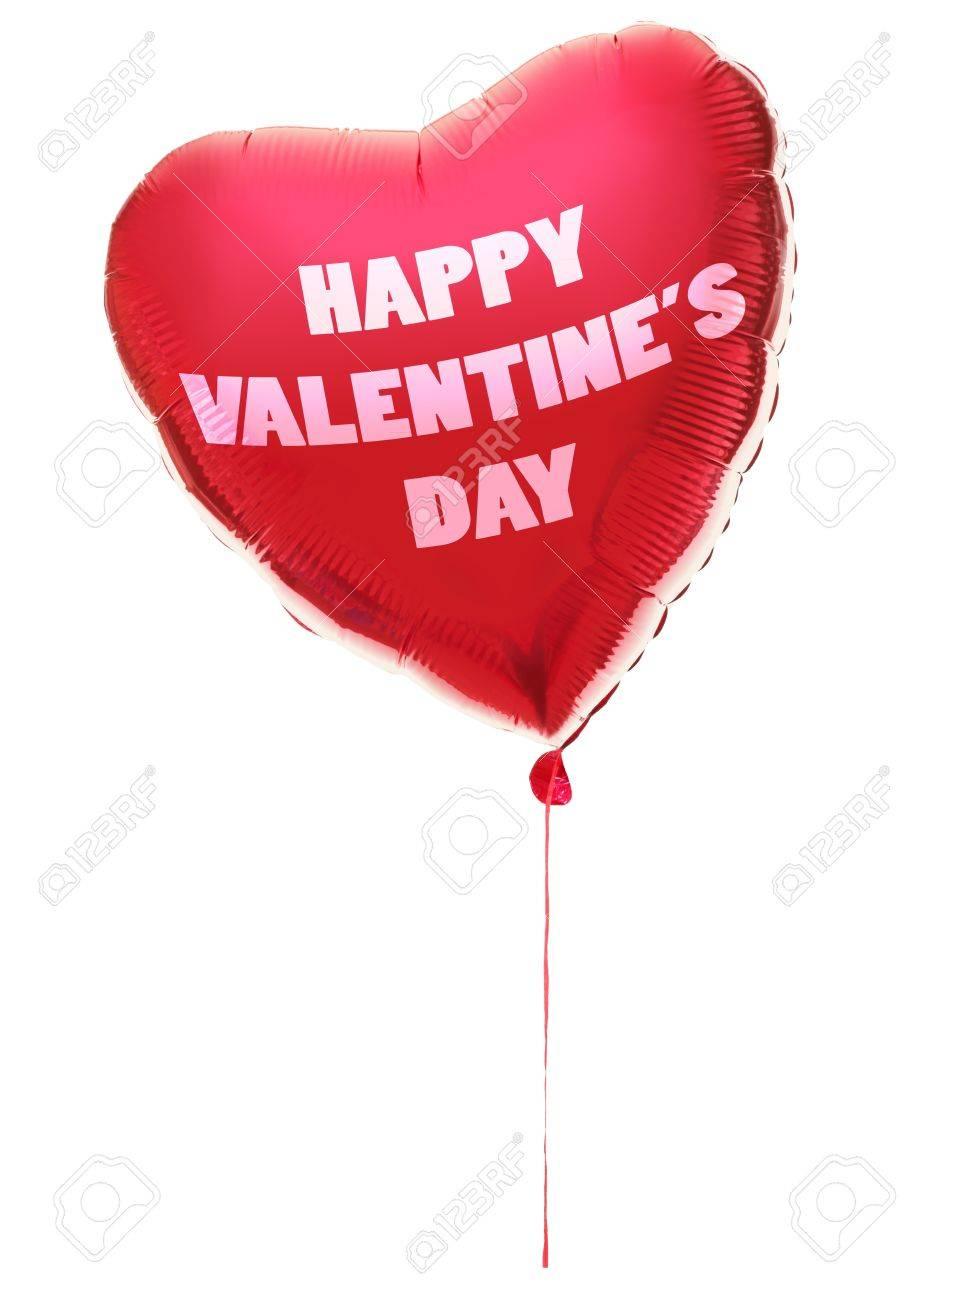 En Forma De Corazn De Globo De Da De San Valentn Con Texto Feliz